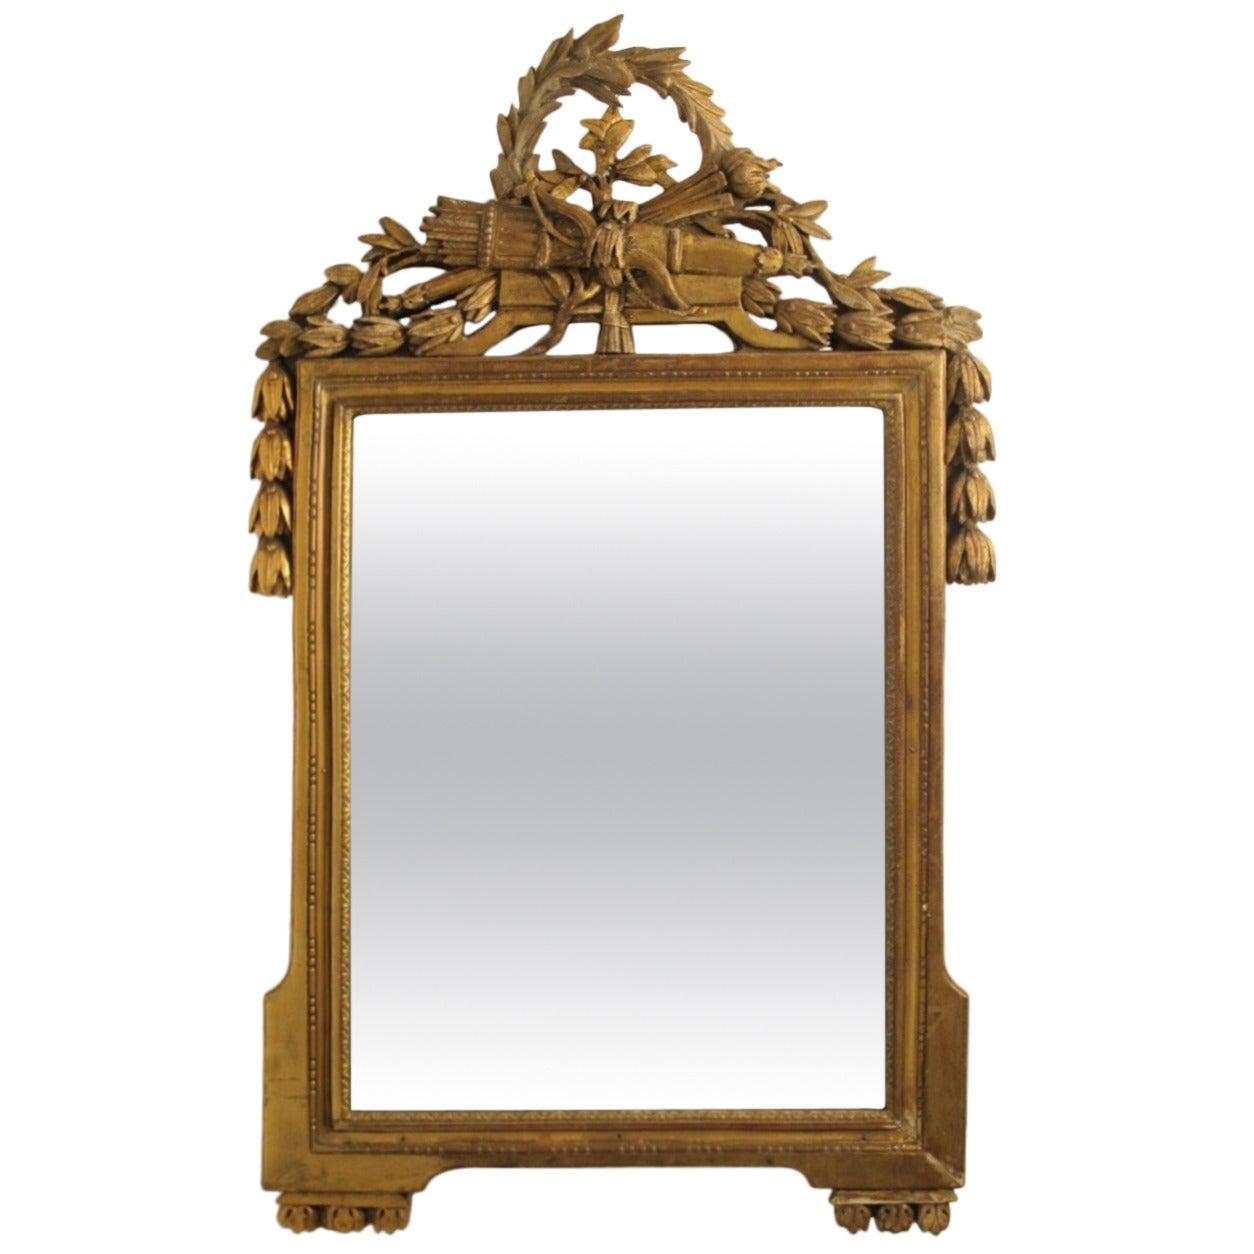 18th Century Louis XVI Gilt Framed Mirror